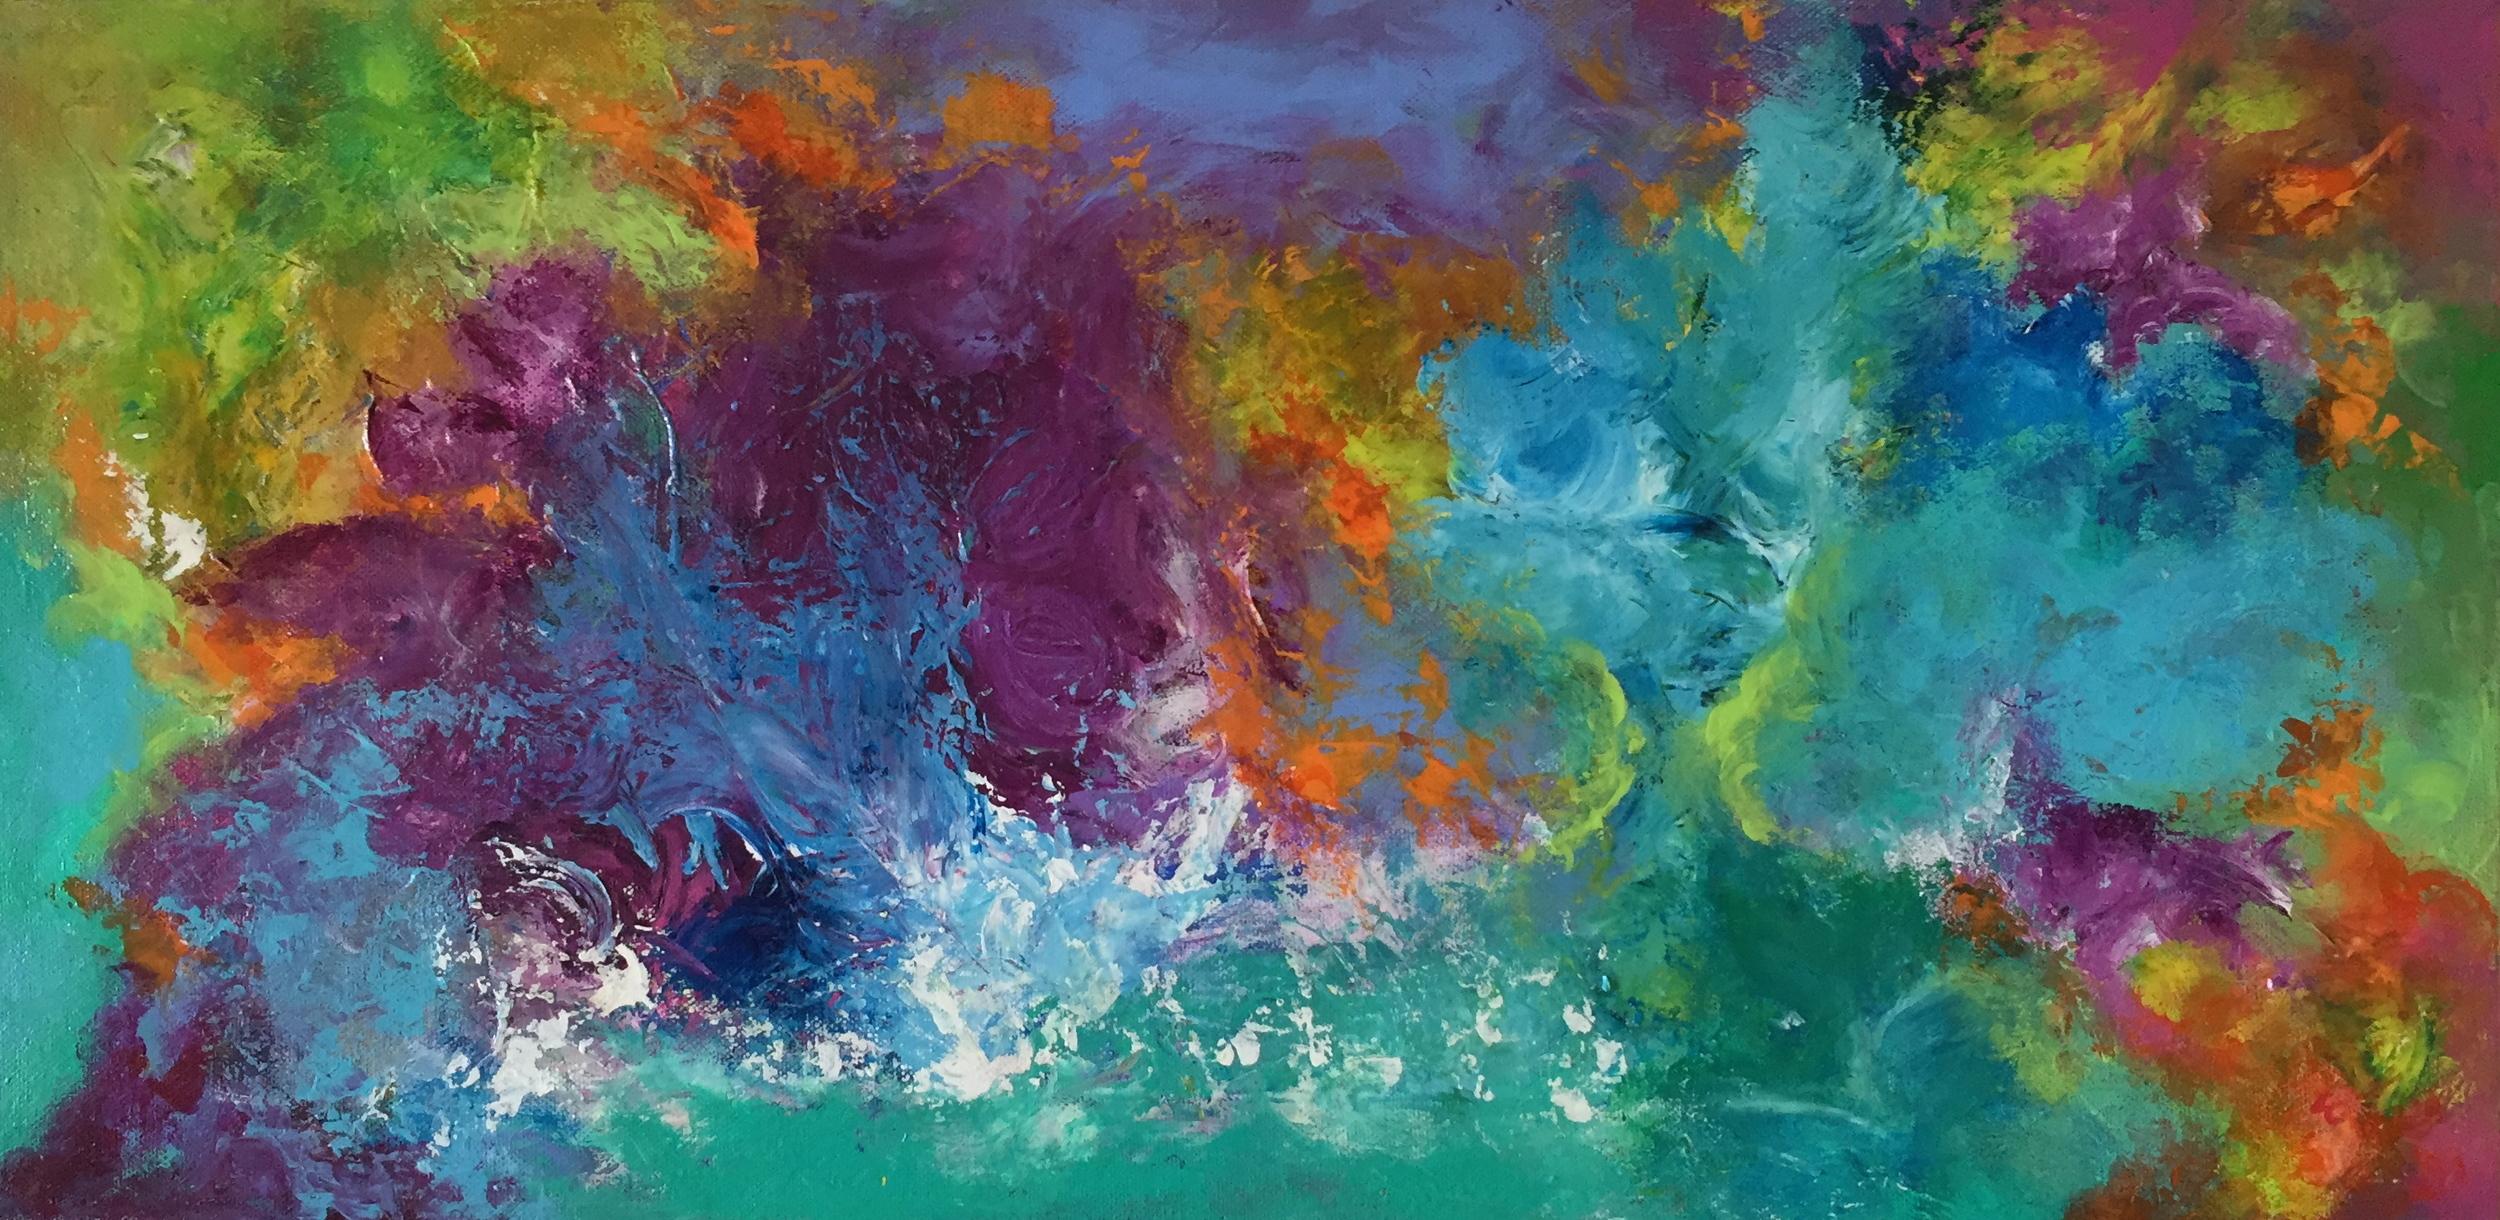 "Emergence 12"" x 24"" acrylic on canvas"